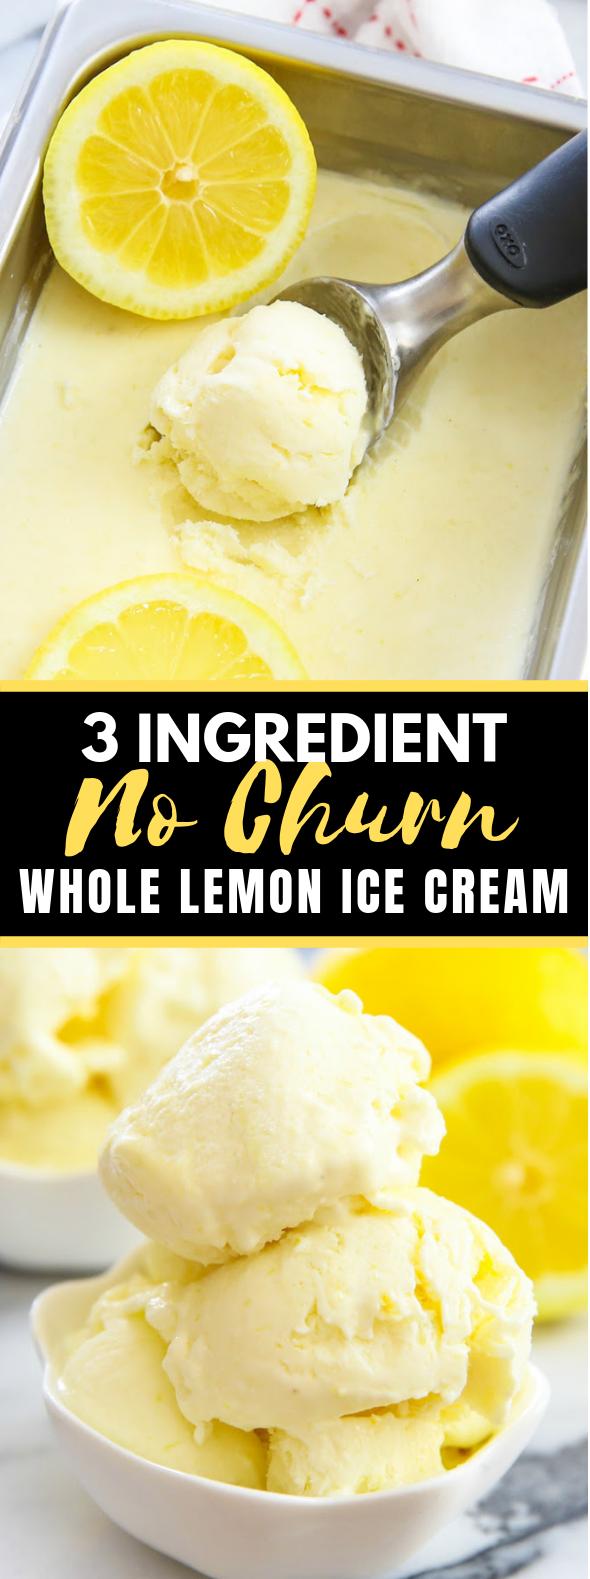 3 INGREDIENT NO CHURN WHOLE LEMON ICE CREAM #desserts #summer